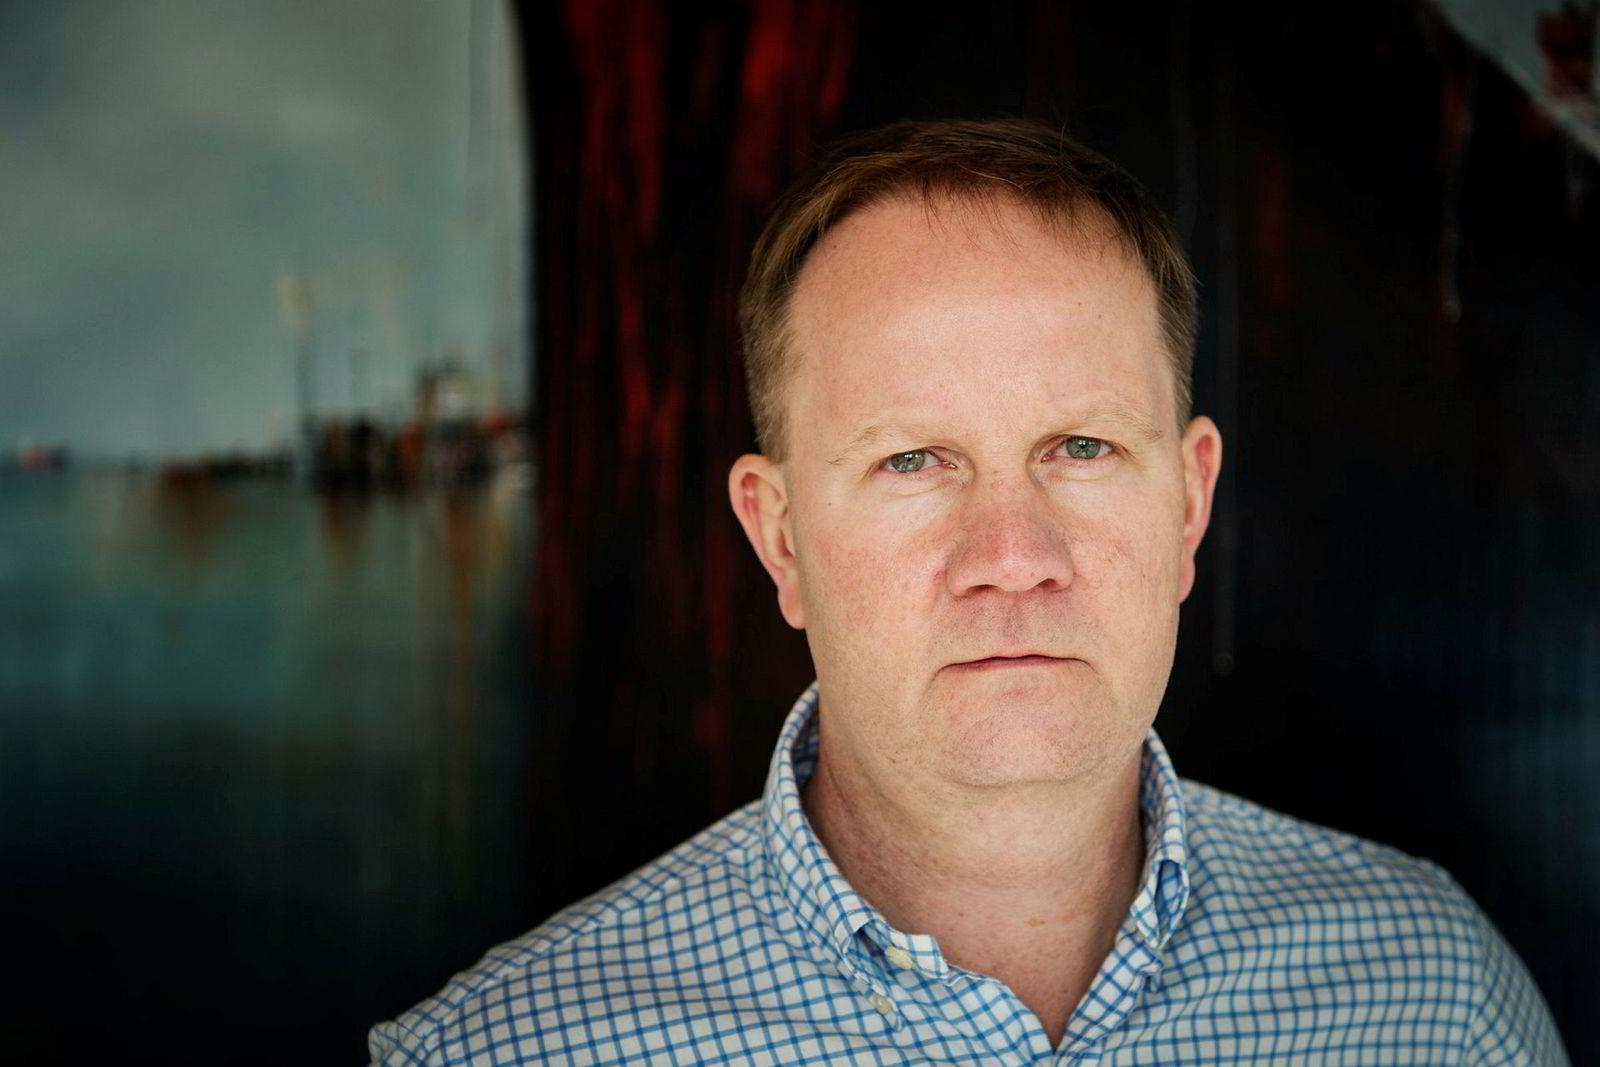 Solstad Offshore-sjef Lars Peder Solstad.